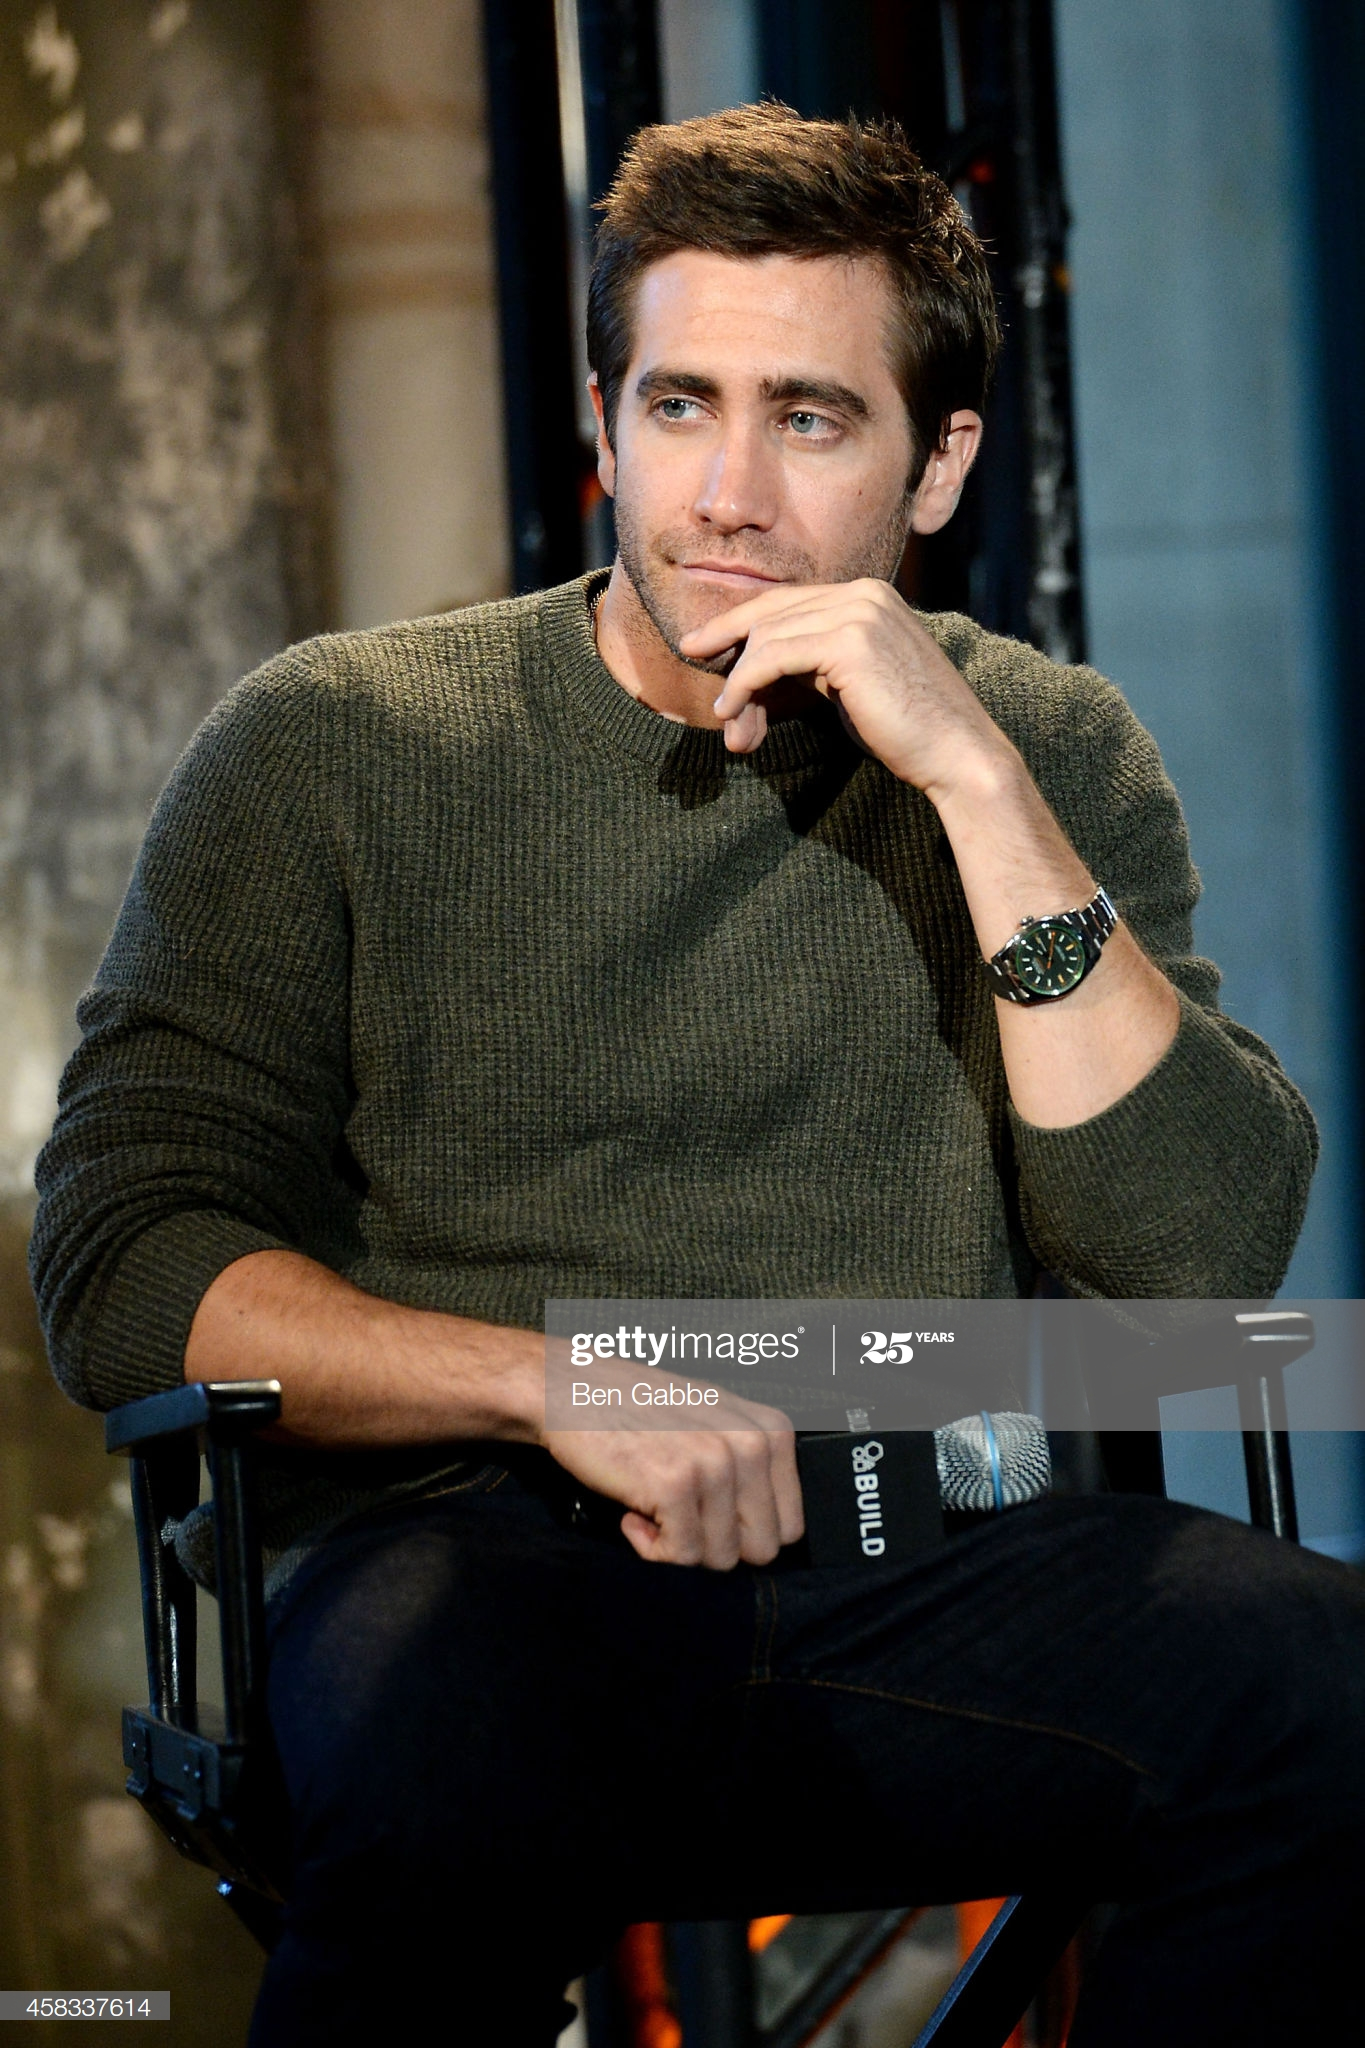 Jake Gyllenhaal - Rolex Milgauss